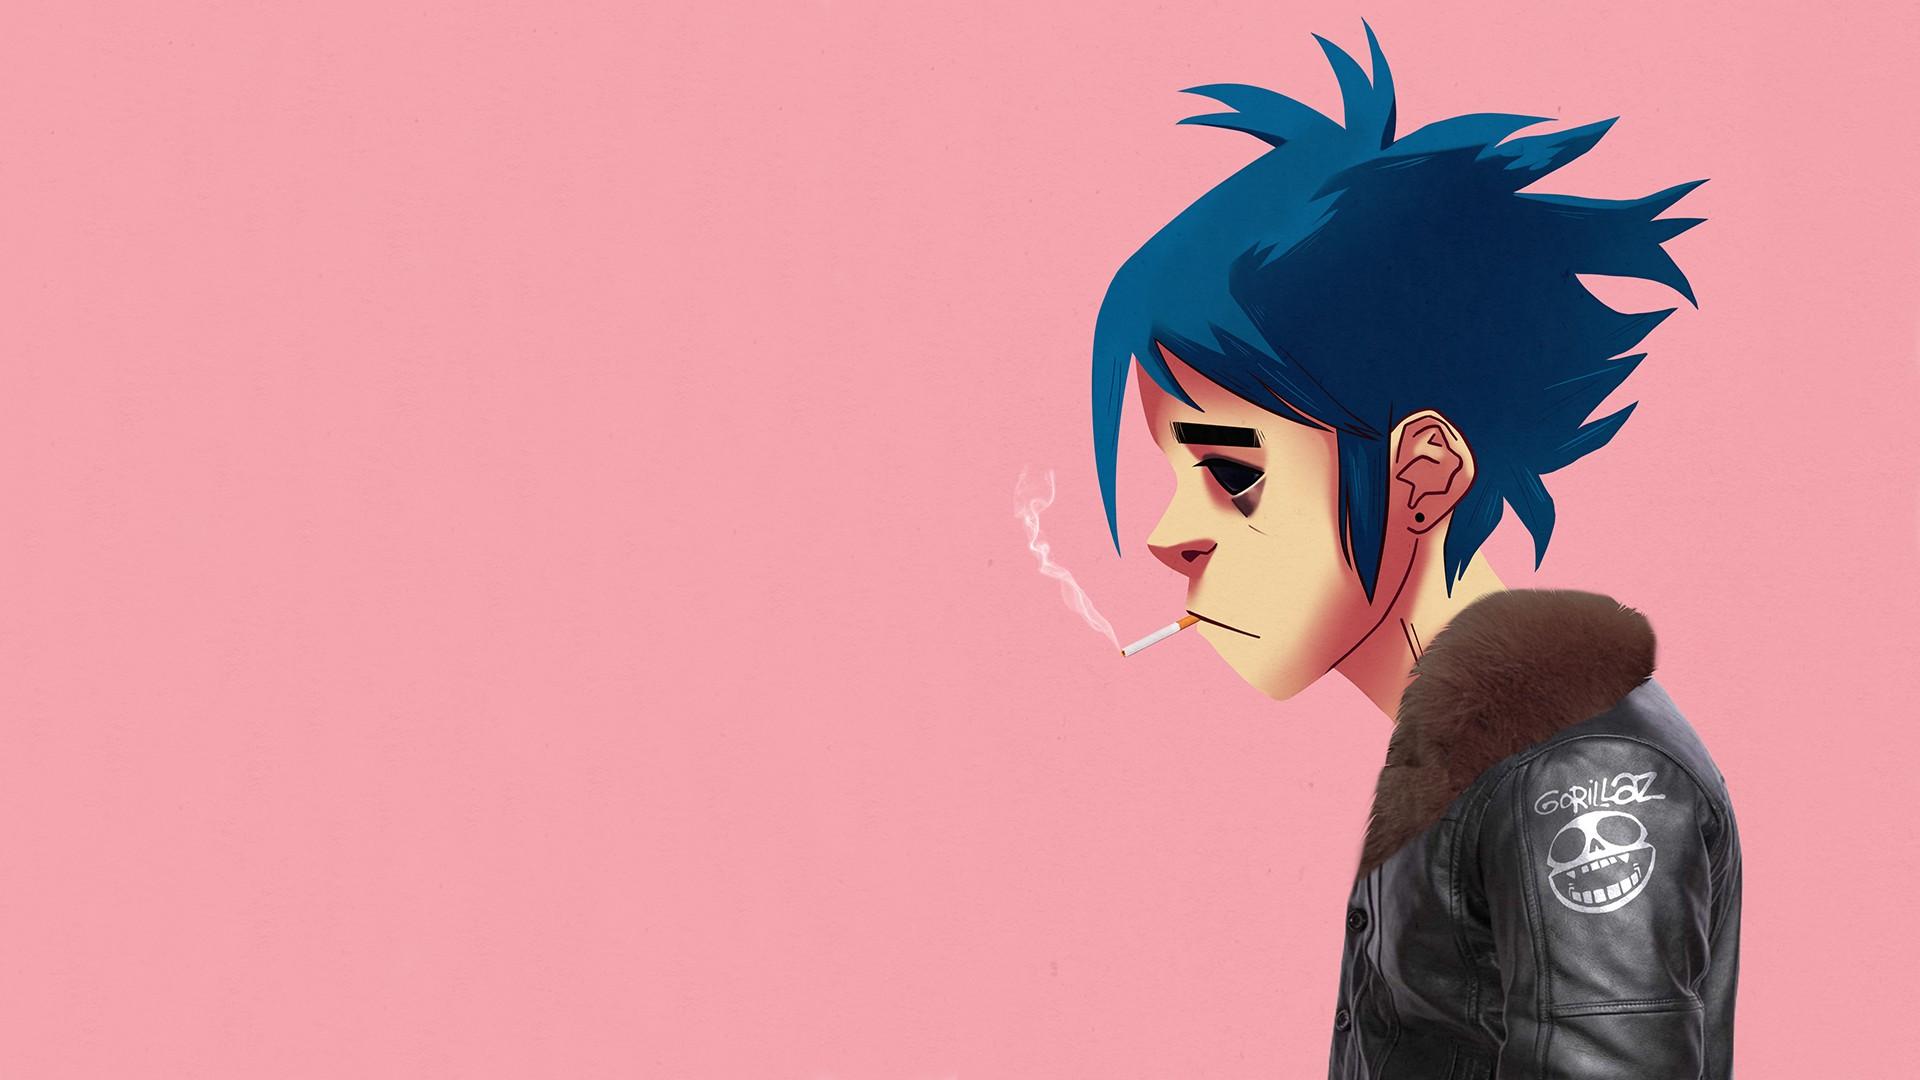 1920x1080 px 2D Gorillaz simple background smoking